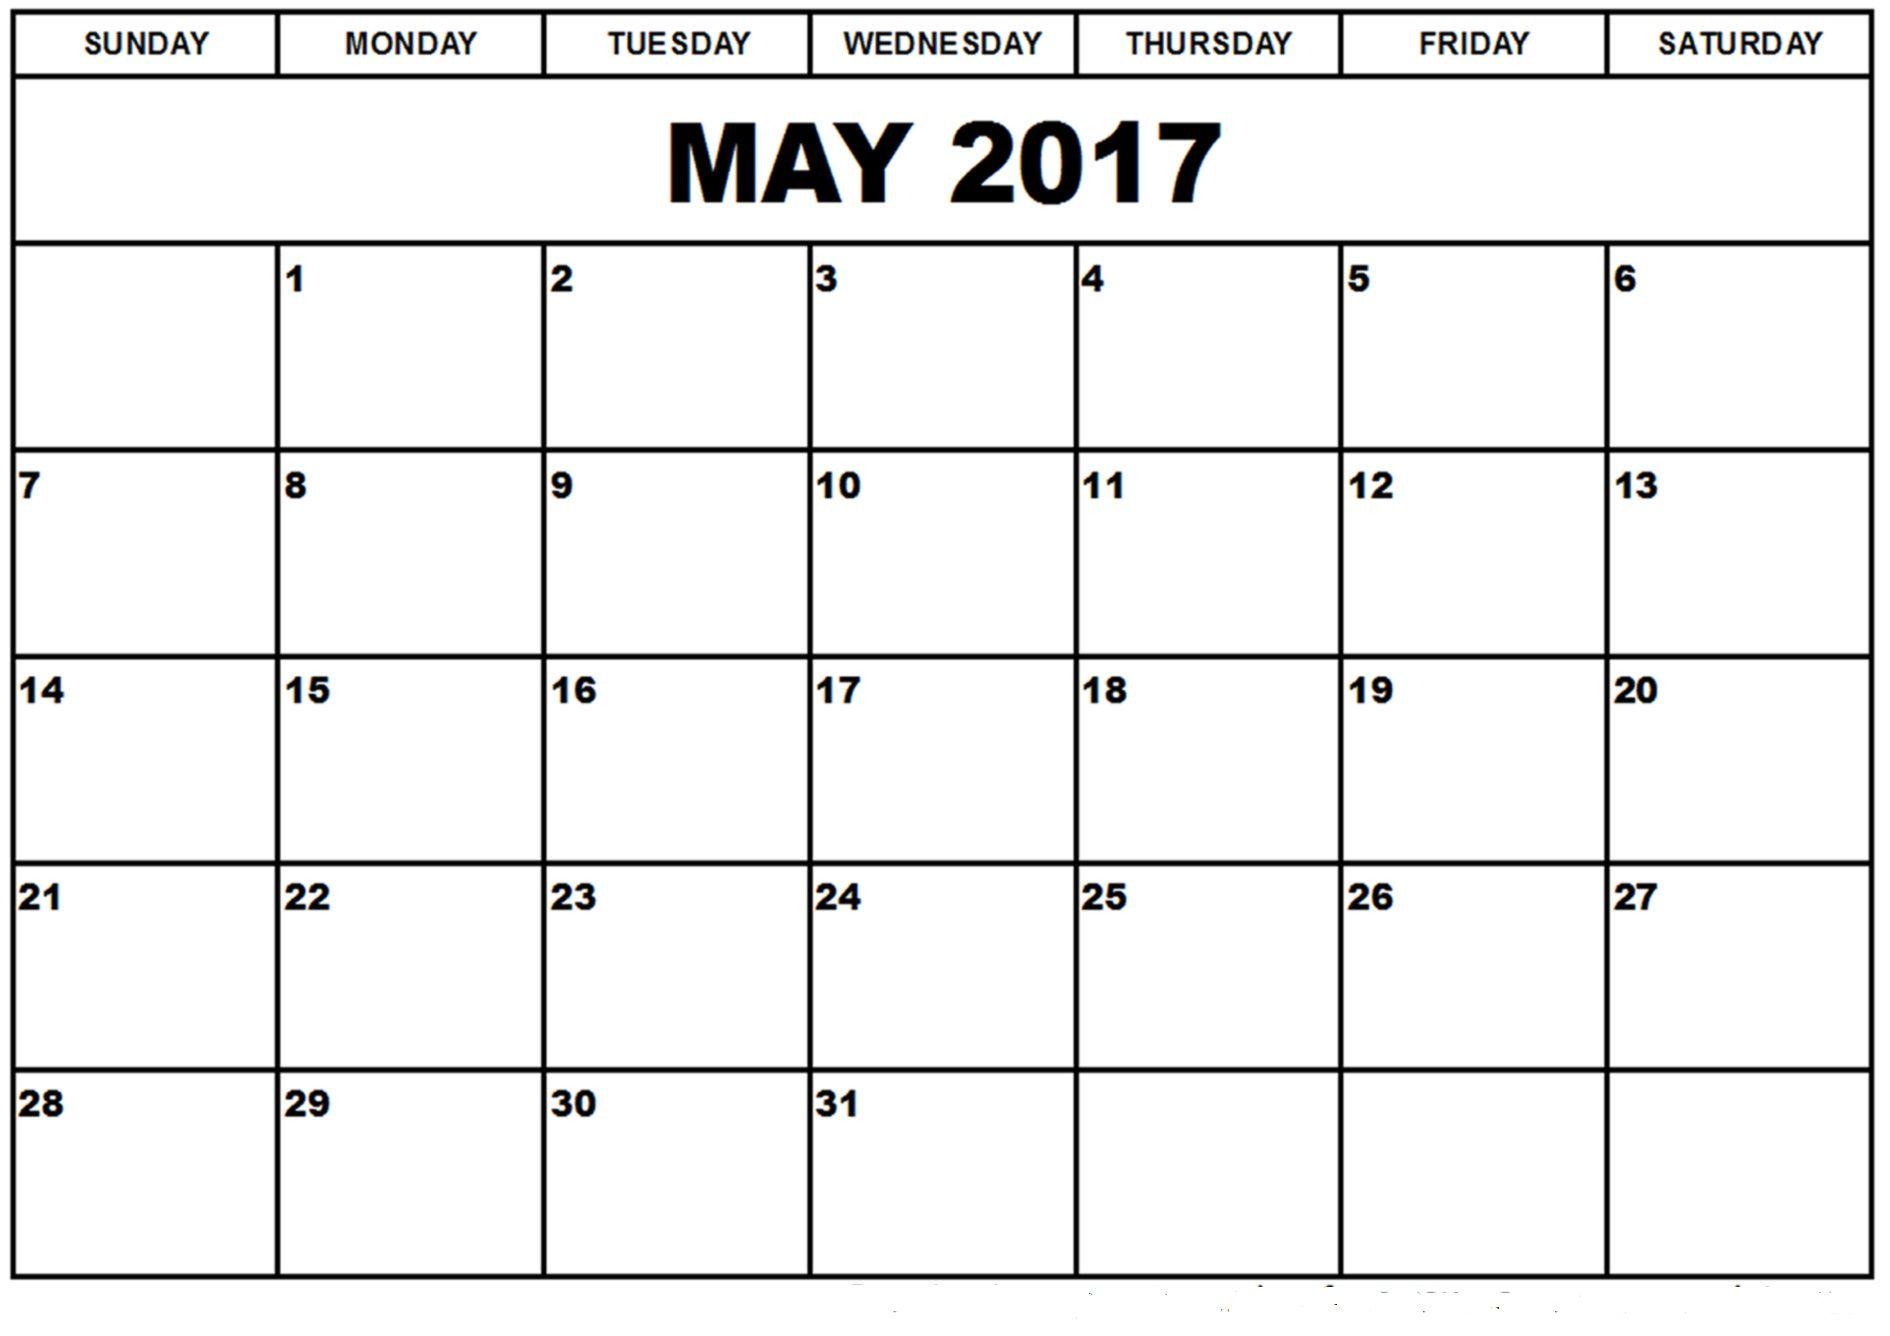 Calendar Planner May : May printable calendar